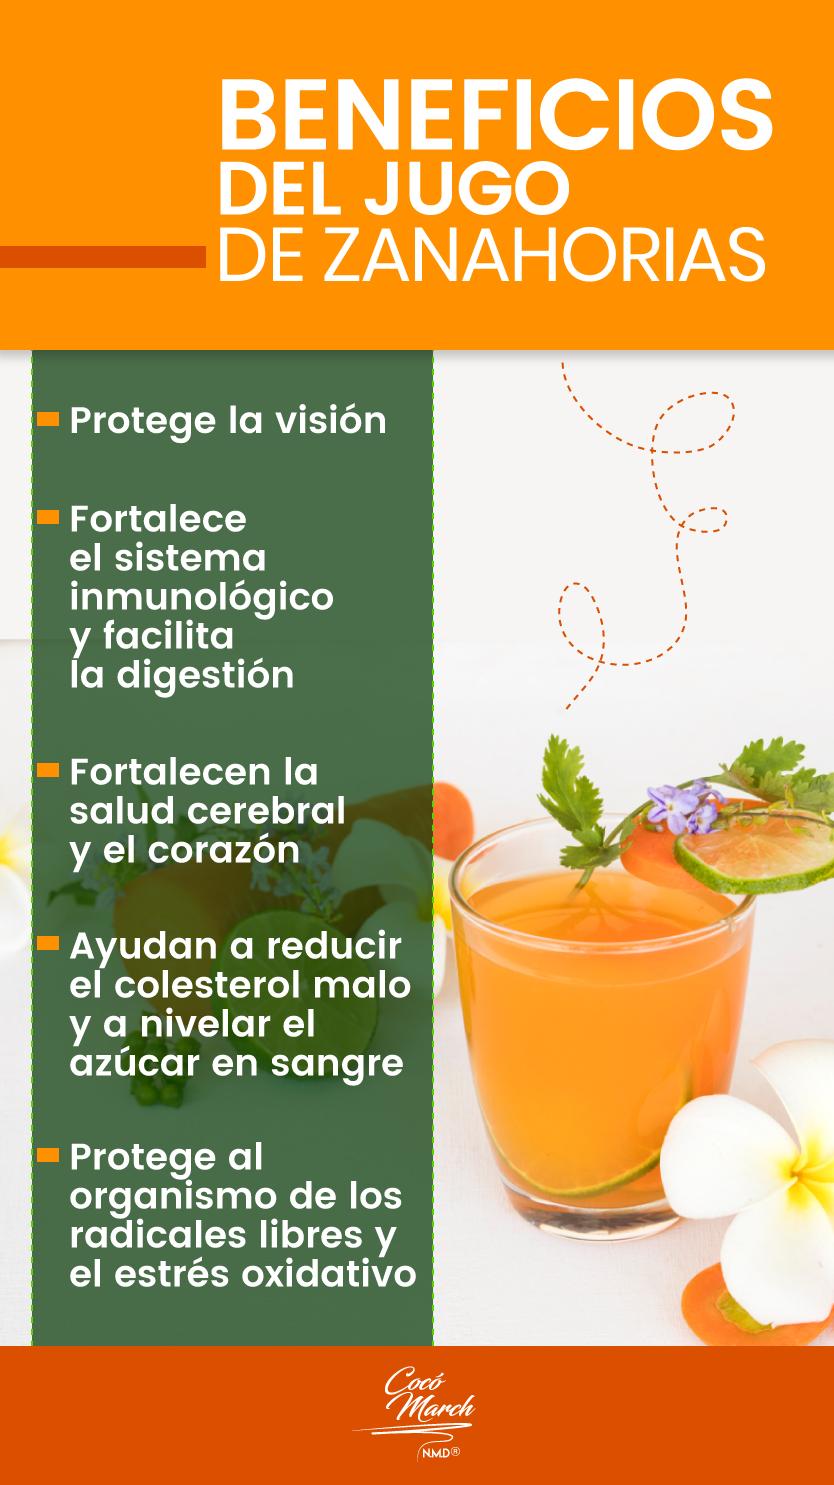 jugo-de-zanahoria-beneficios